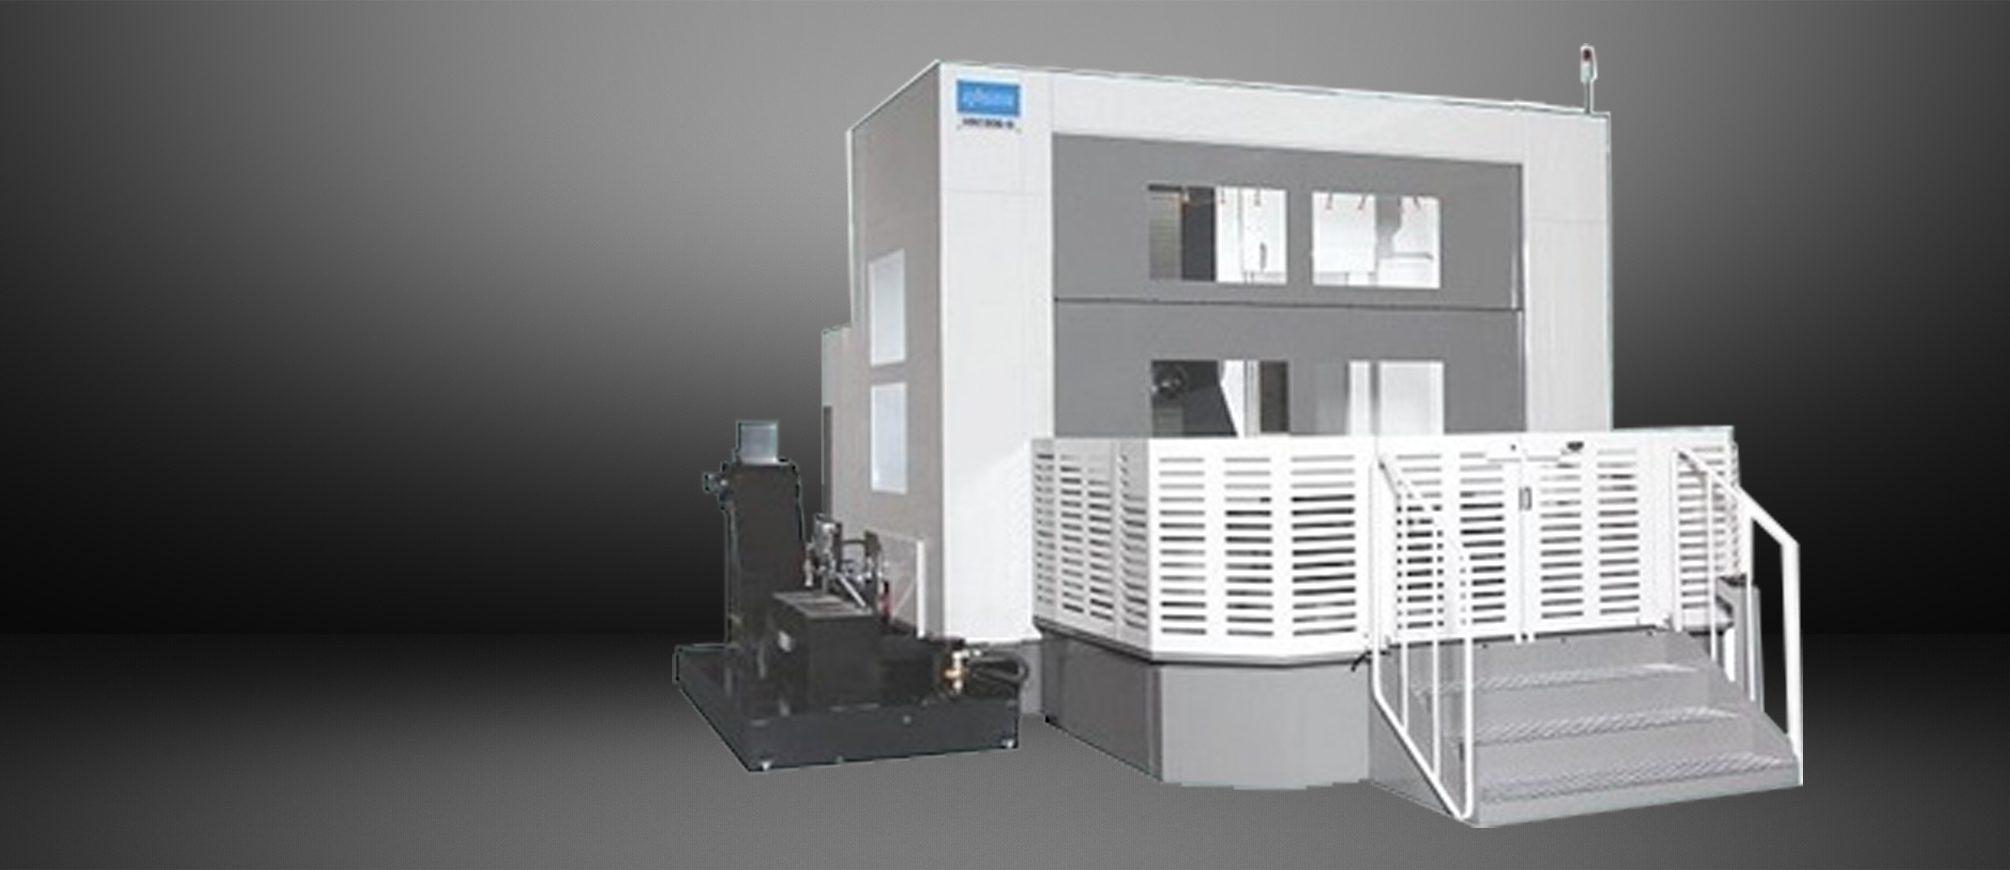 HN800-S BAR Horizontal Machining Centers